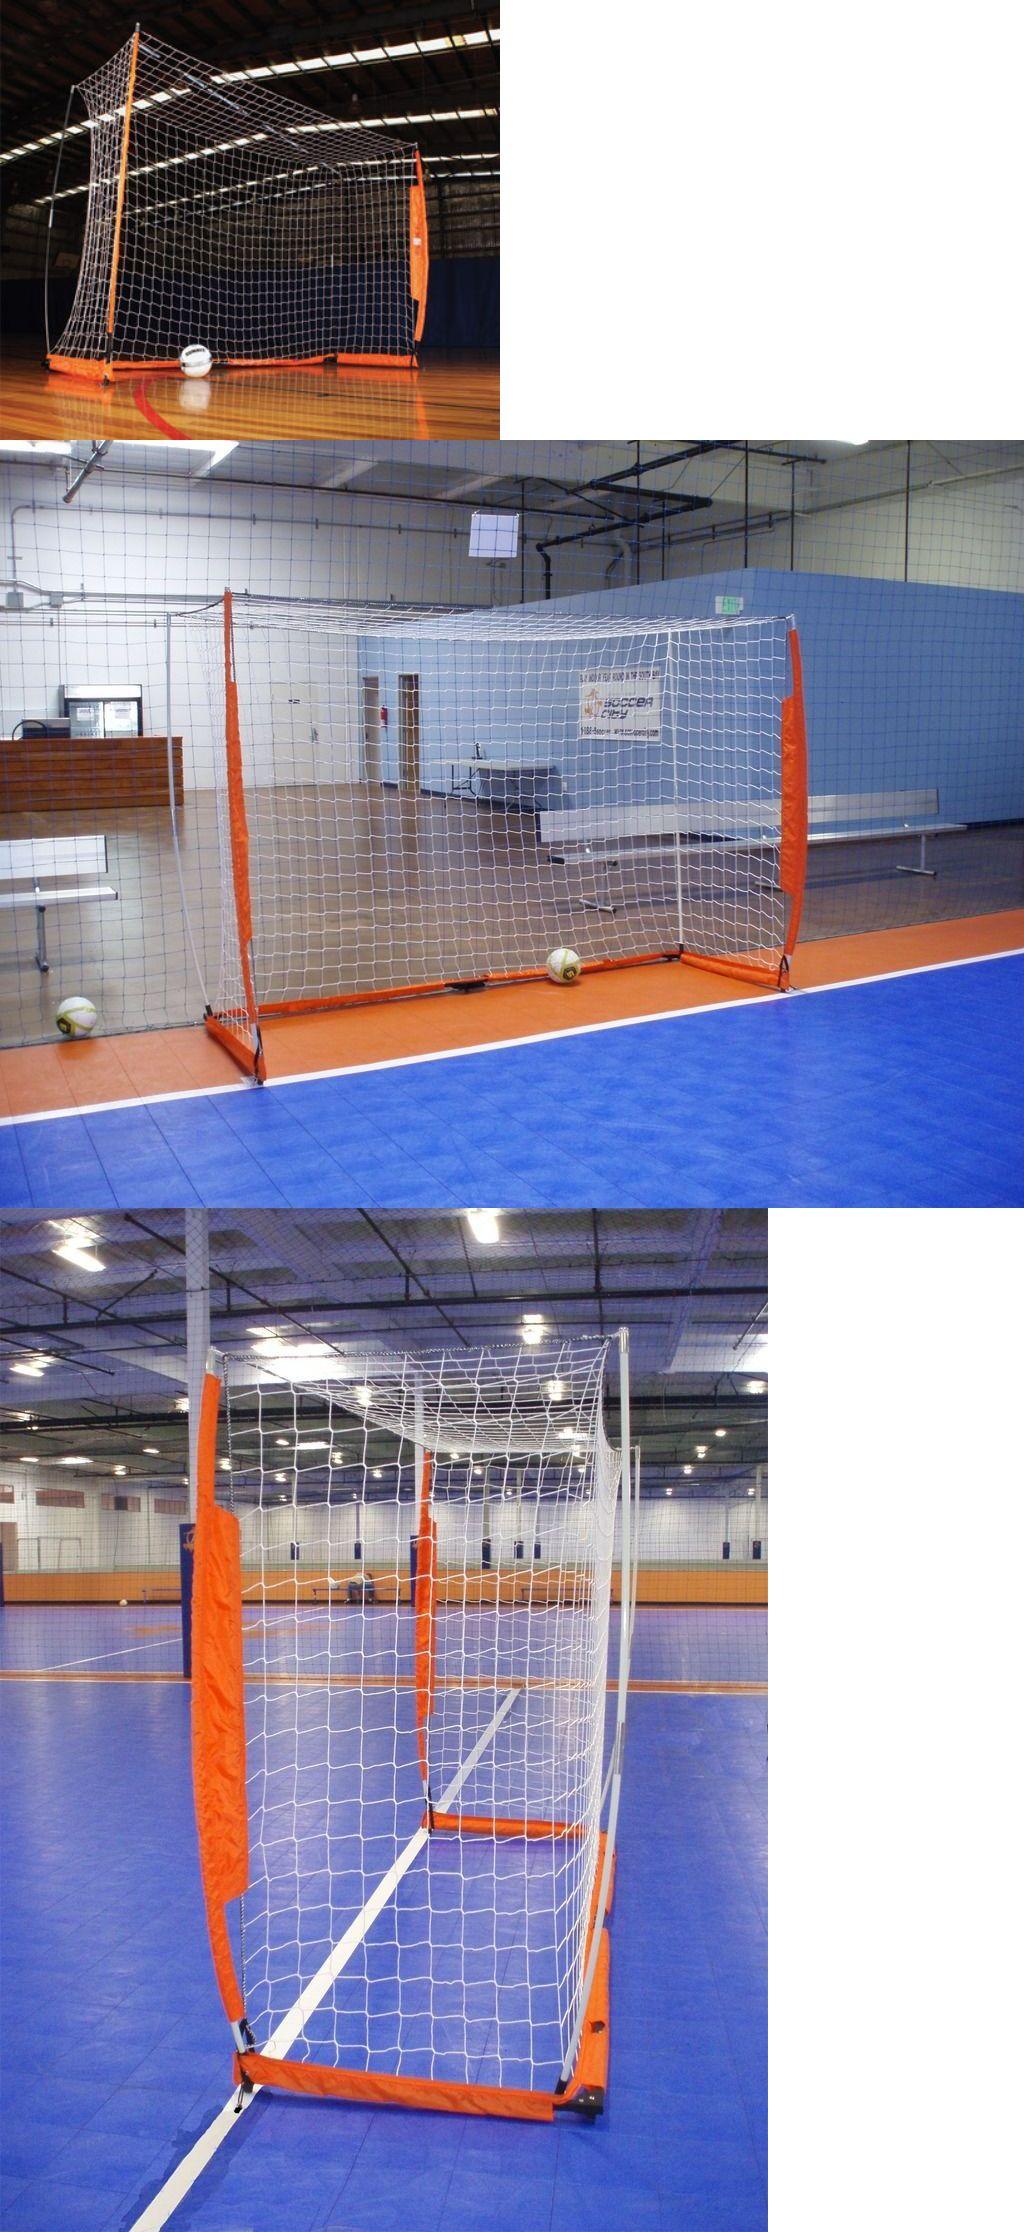 Goals and Nets 159180: Bownet Futsal Goal 2M X 3M Portable Soccer ...